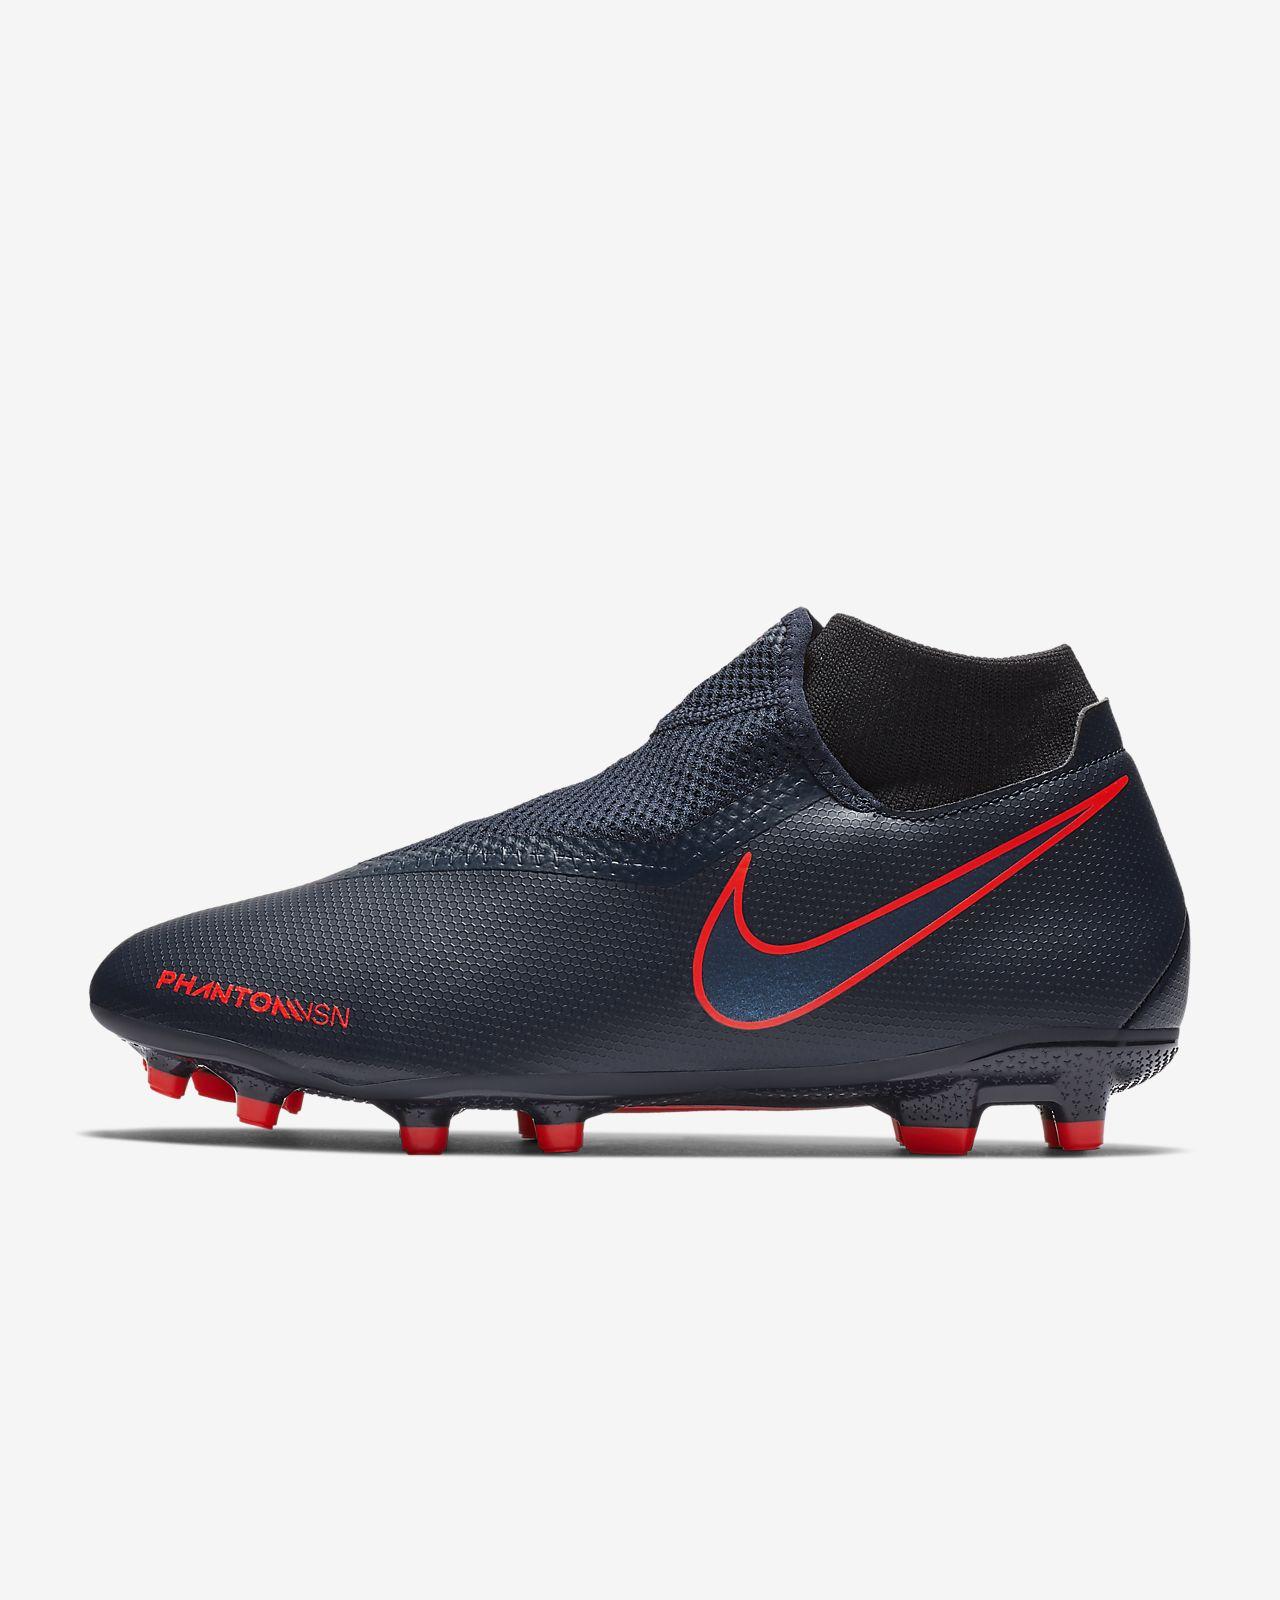 De Fit Para Academy Nike Phantomvsn Dynamic Mg Botas Fútbol wqqYtA8r e5e481f8d384f